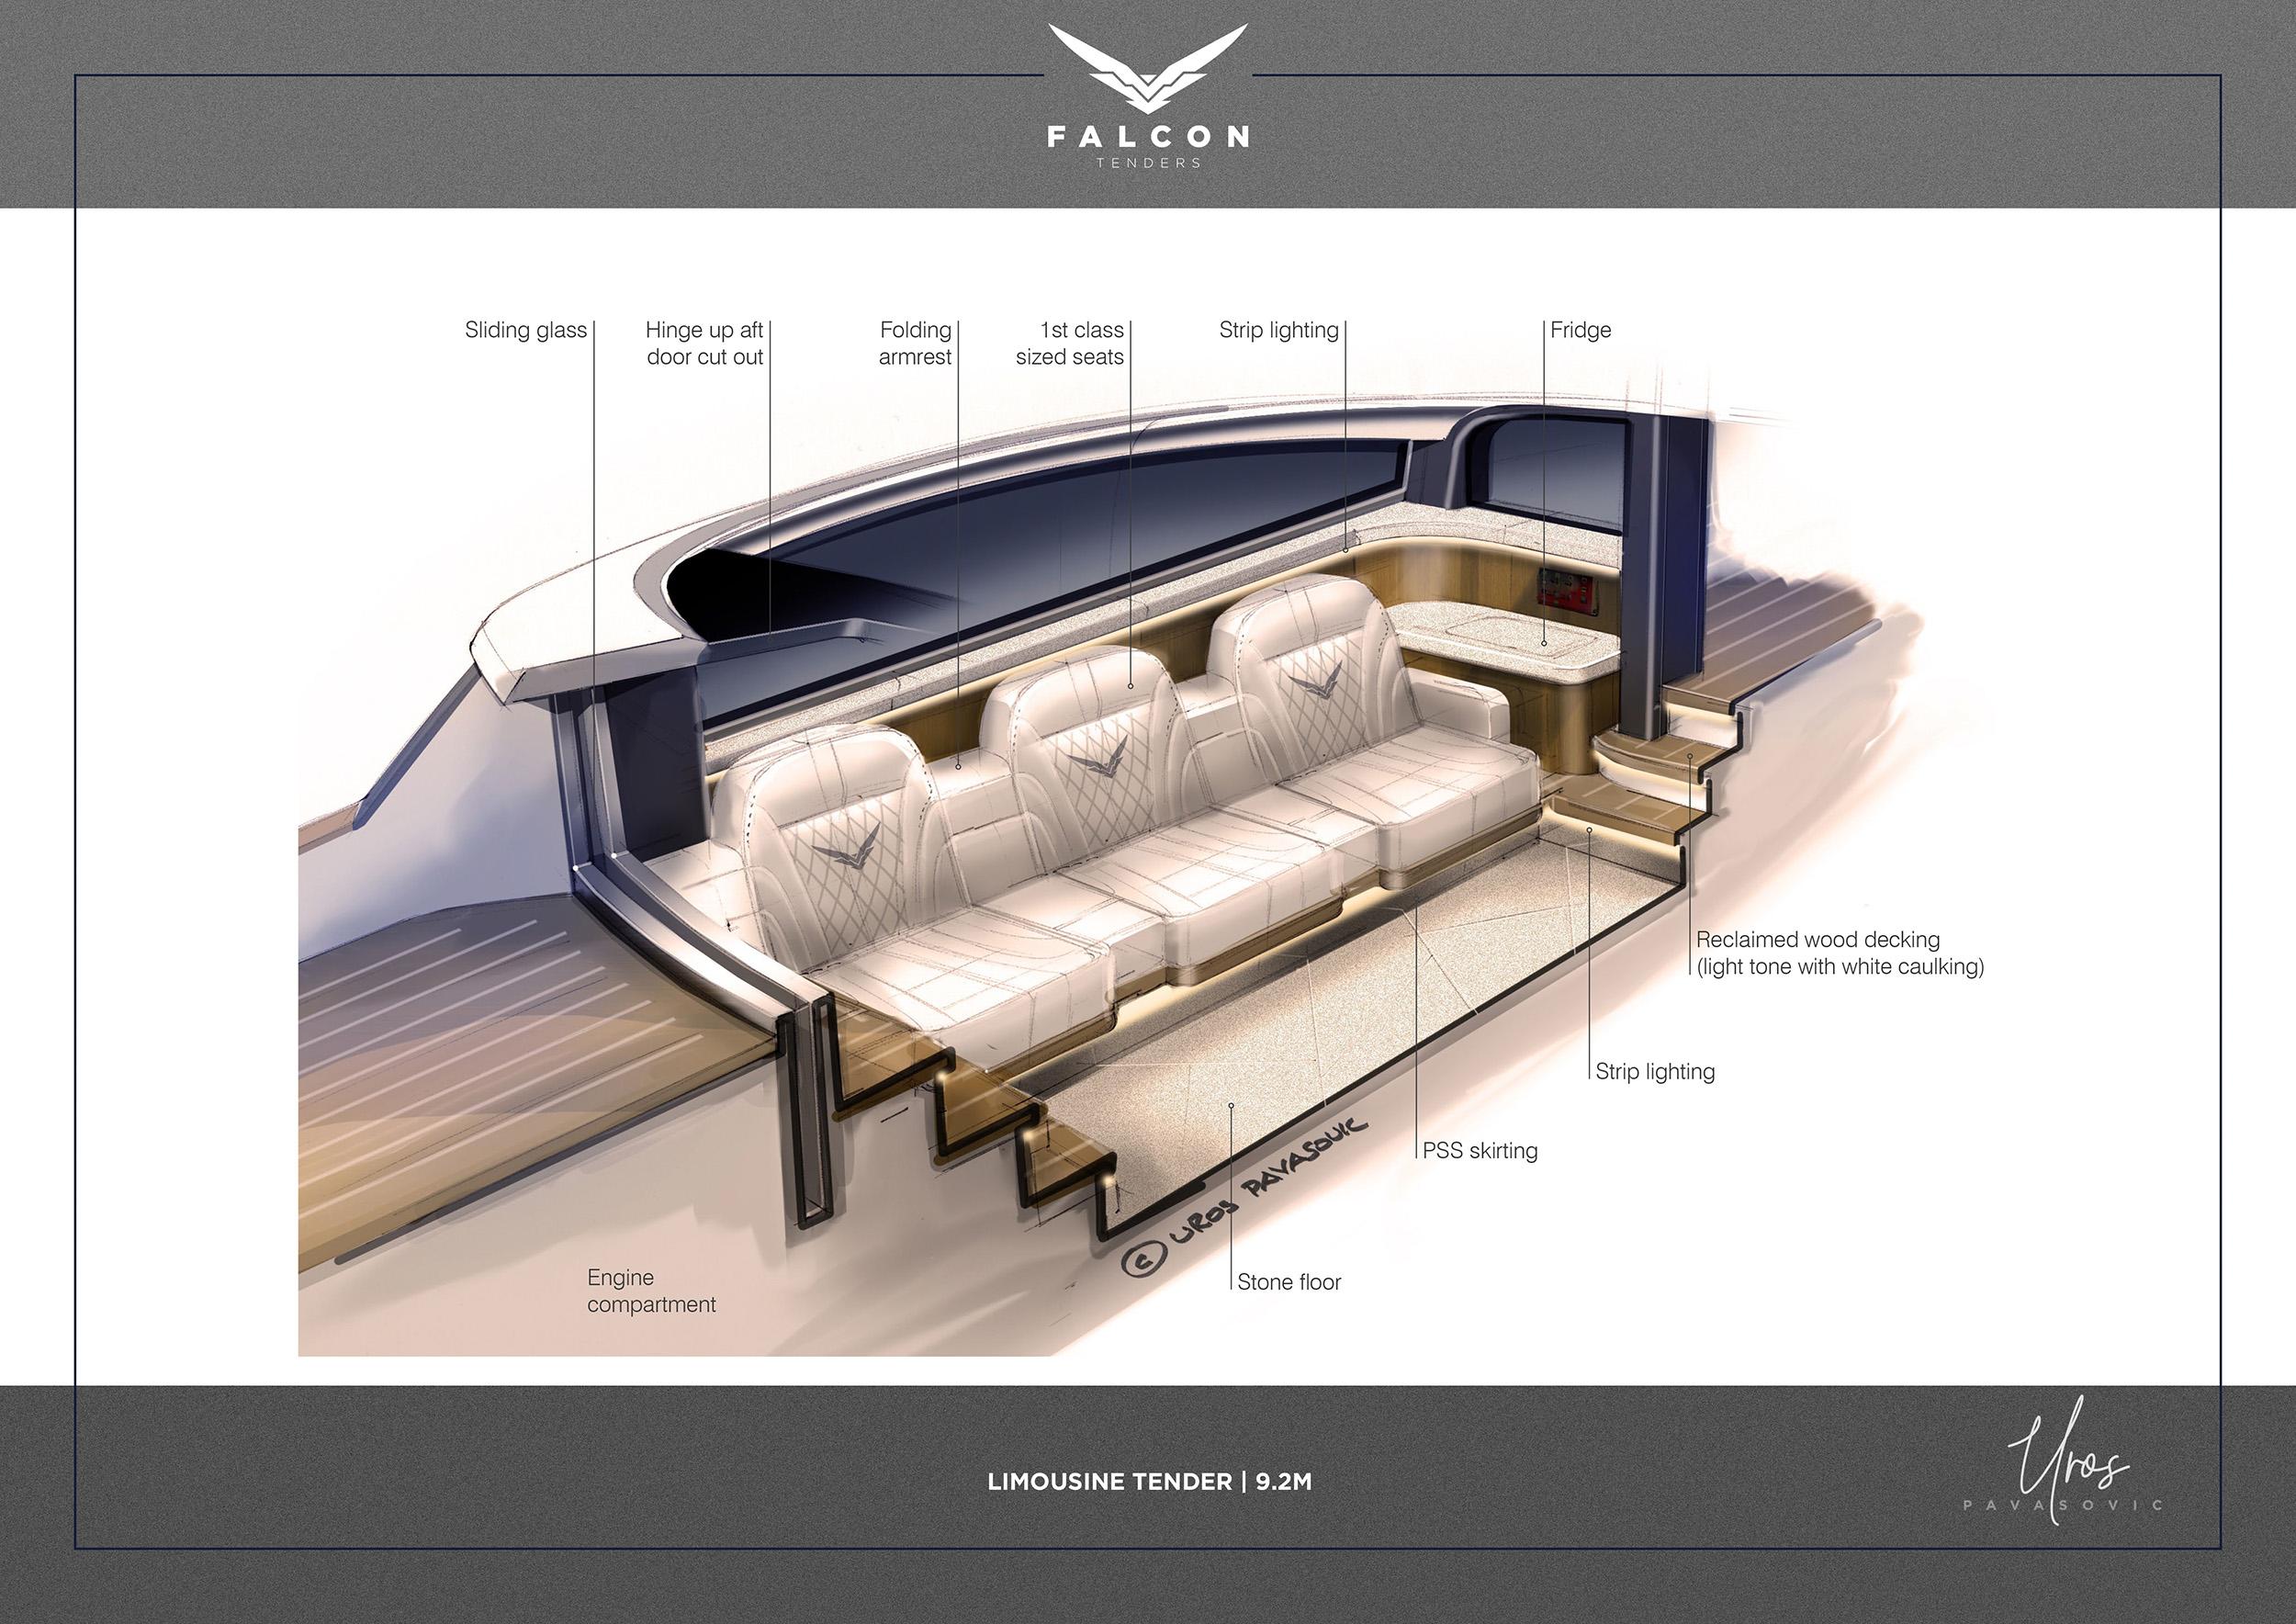 Falcon tenders interior designed by Uros Pavasovic